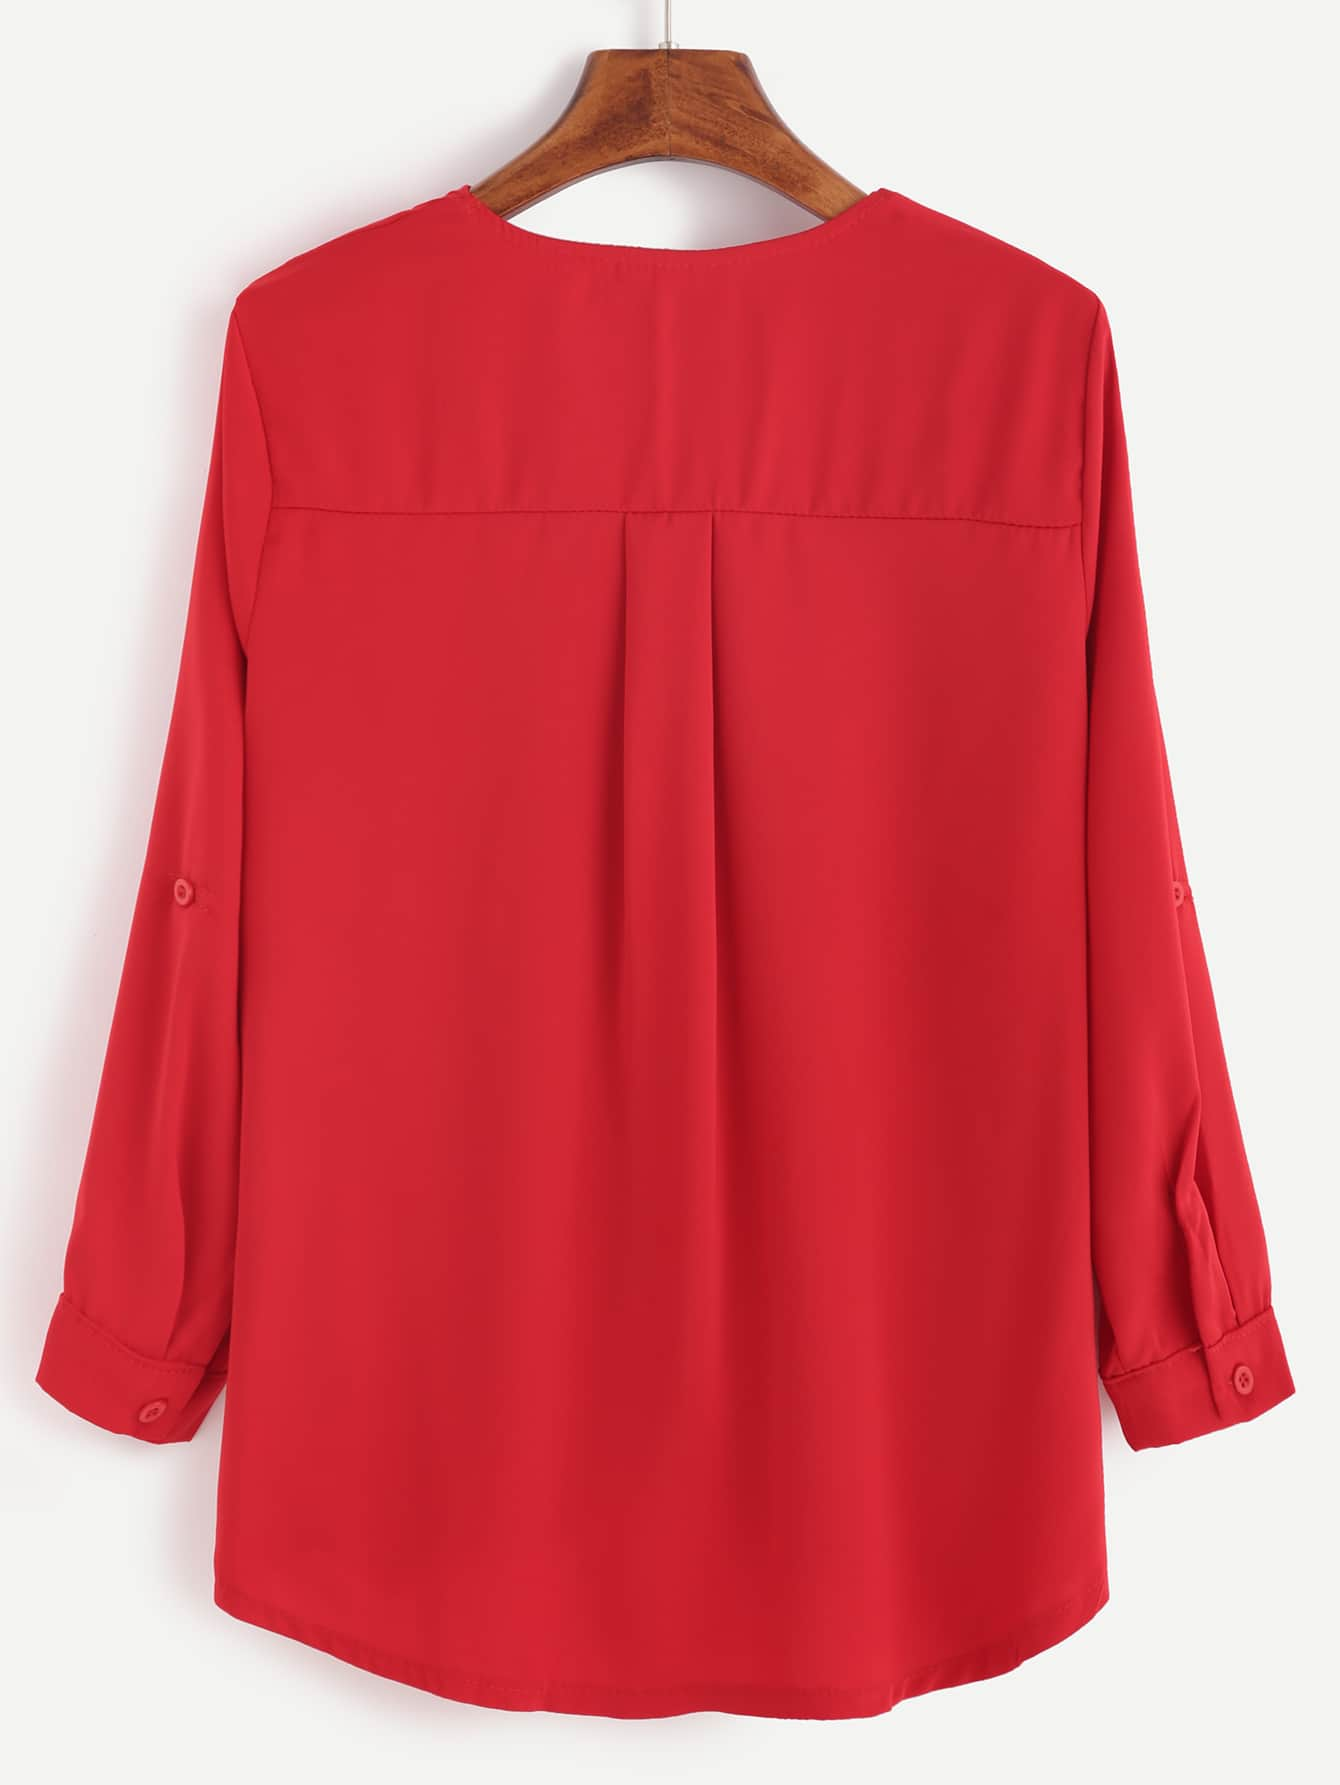 blouse160927001_2